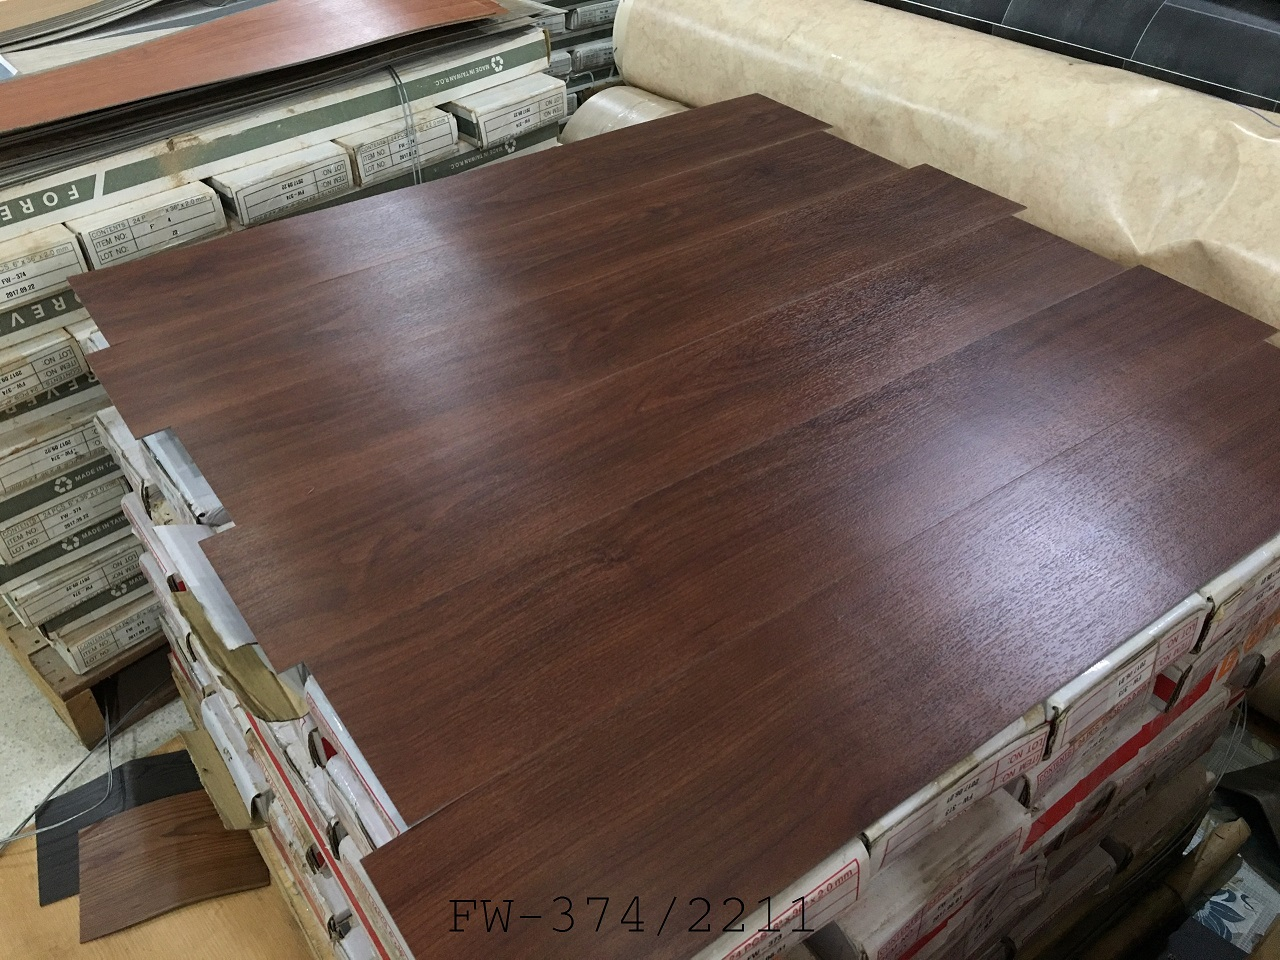 sàn nhựa giả gỗ, sàn nhựa vân gỗ, sàn nhựa vinyl, sàn nhựa taiwan